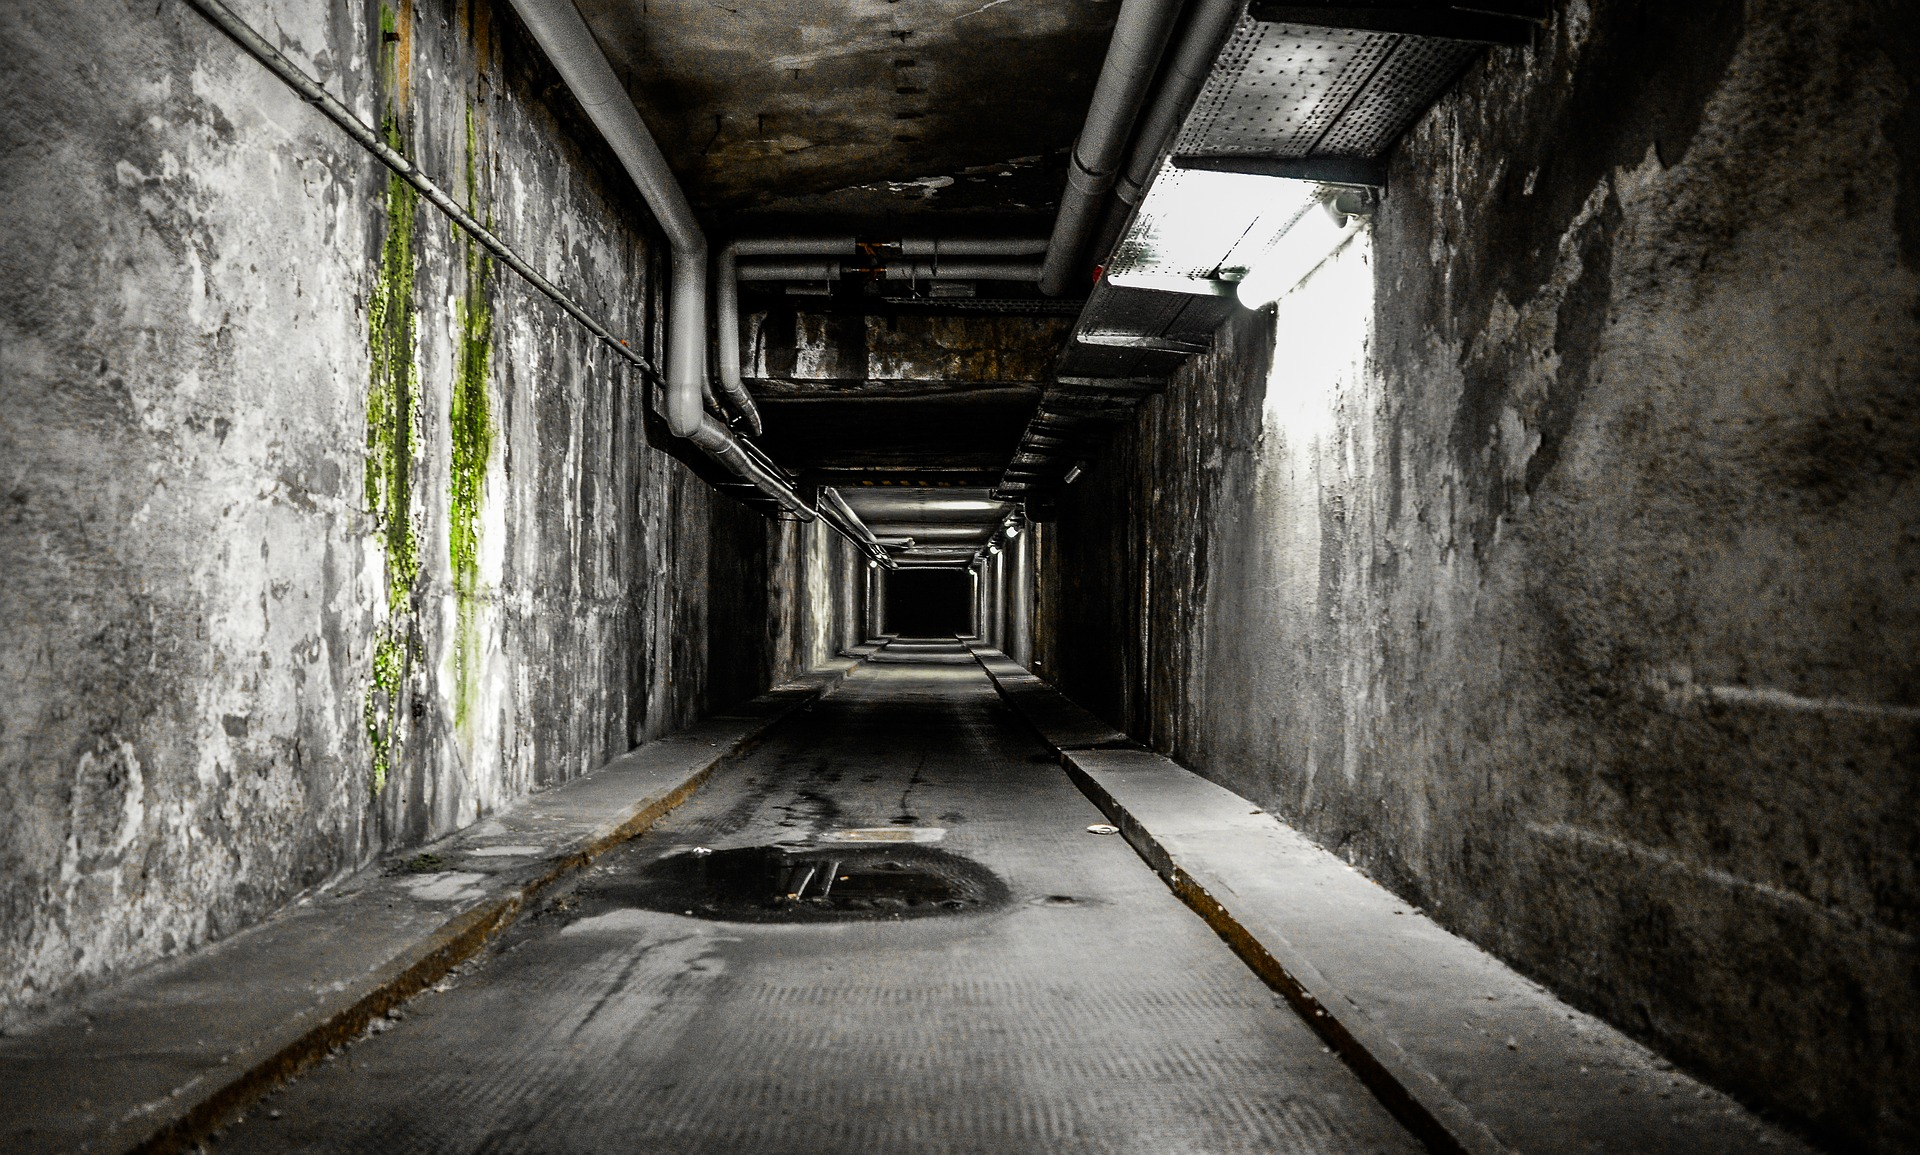 pasadizo, túnel, escalofrío, miedo, oscuridad - Fondos de Pantalla HD - professor-falken.com